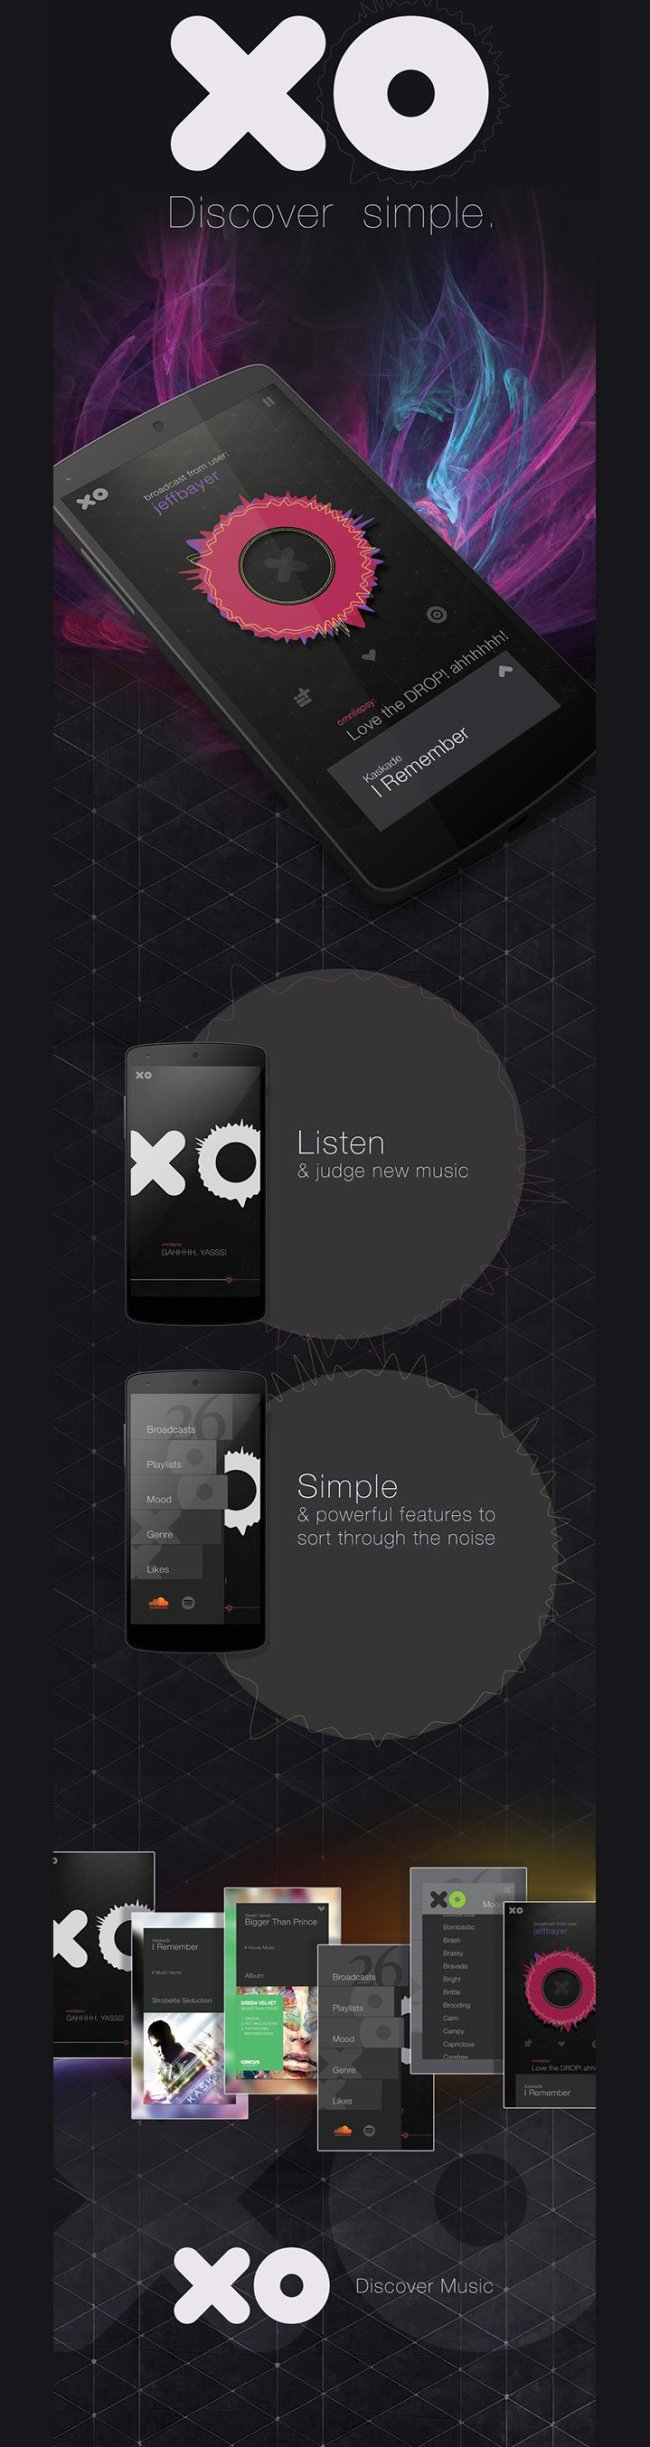 XO-App-Design